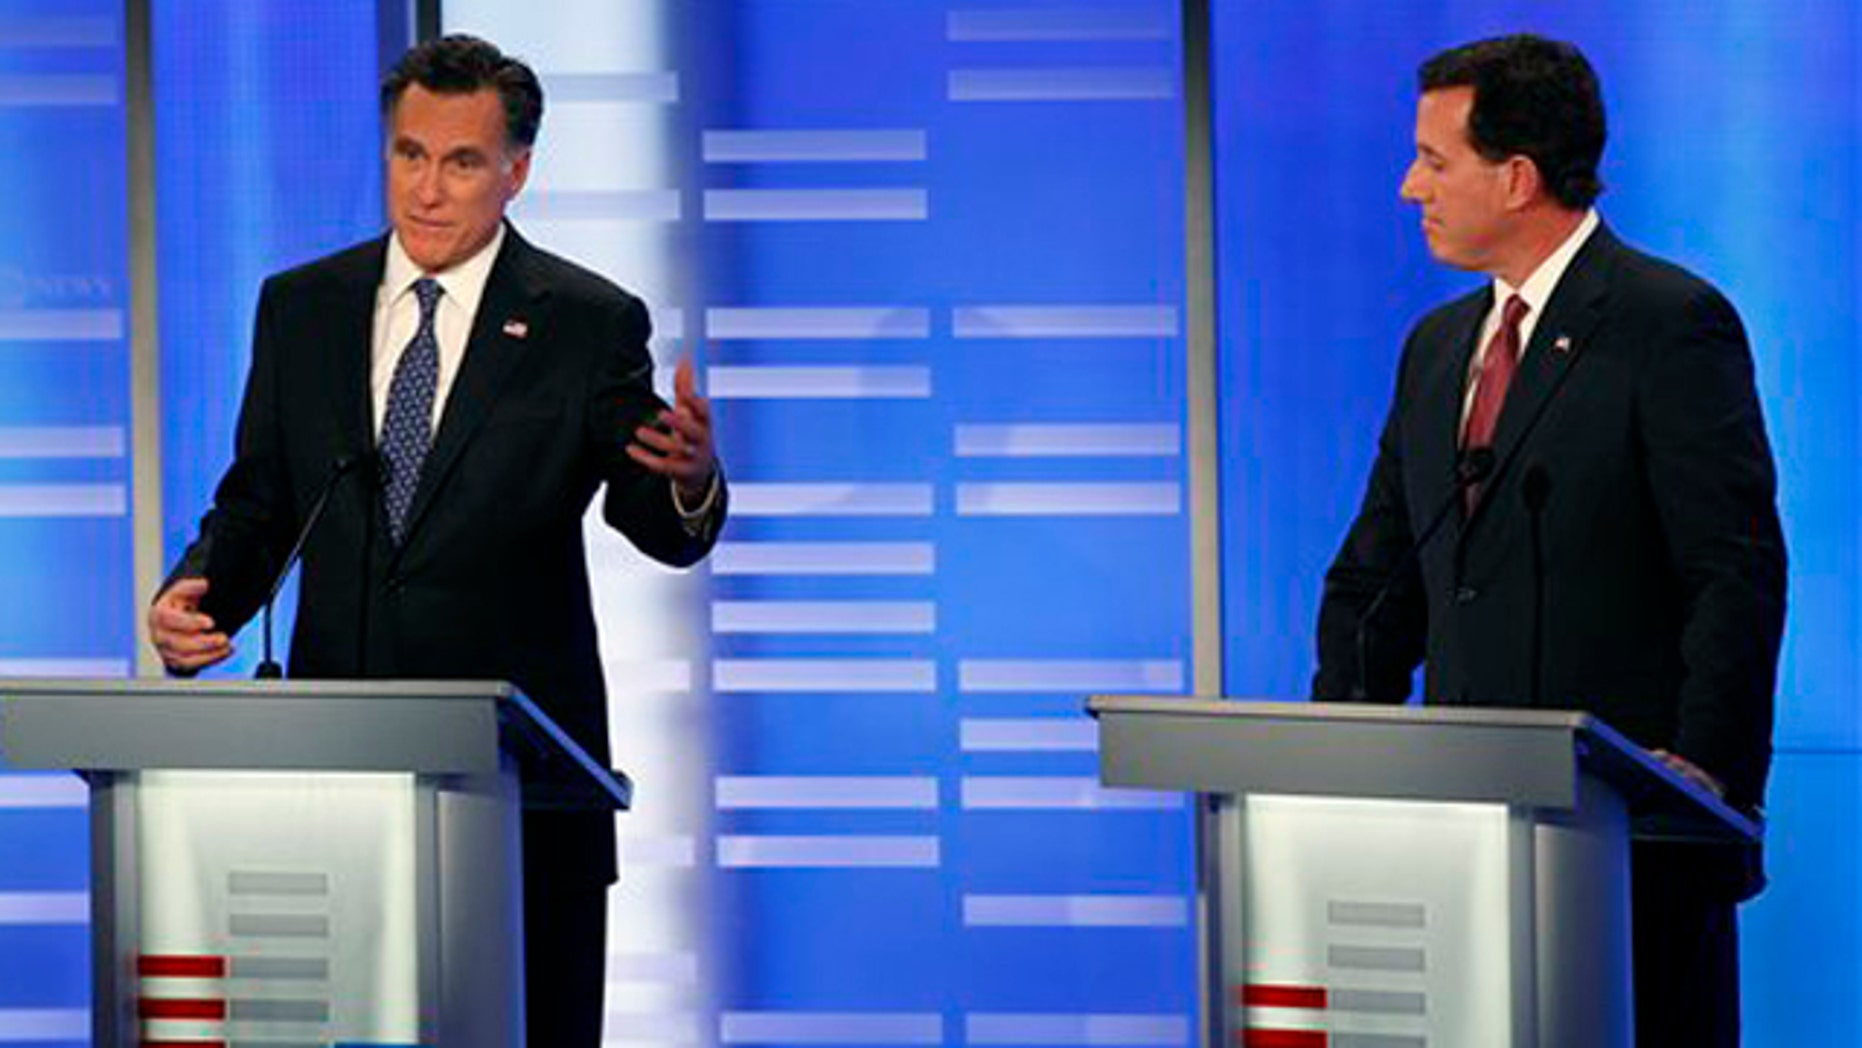 Jan. 7, 2012: Former Massachusetts Gov. Mitt Romney, left, answers a question as former Pennsylvania Sen. Rick Santorum listens during a Republican presidential candidate debate at Saint Anselm College in Manchester, N.H.